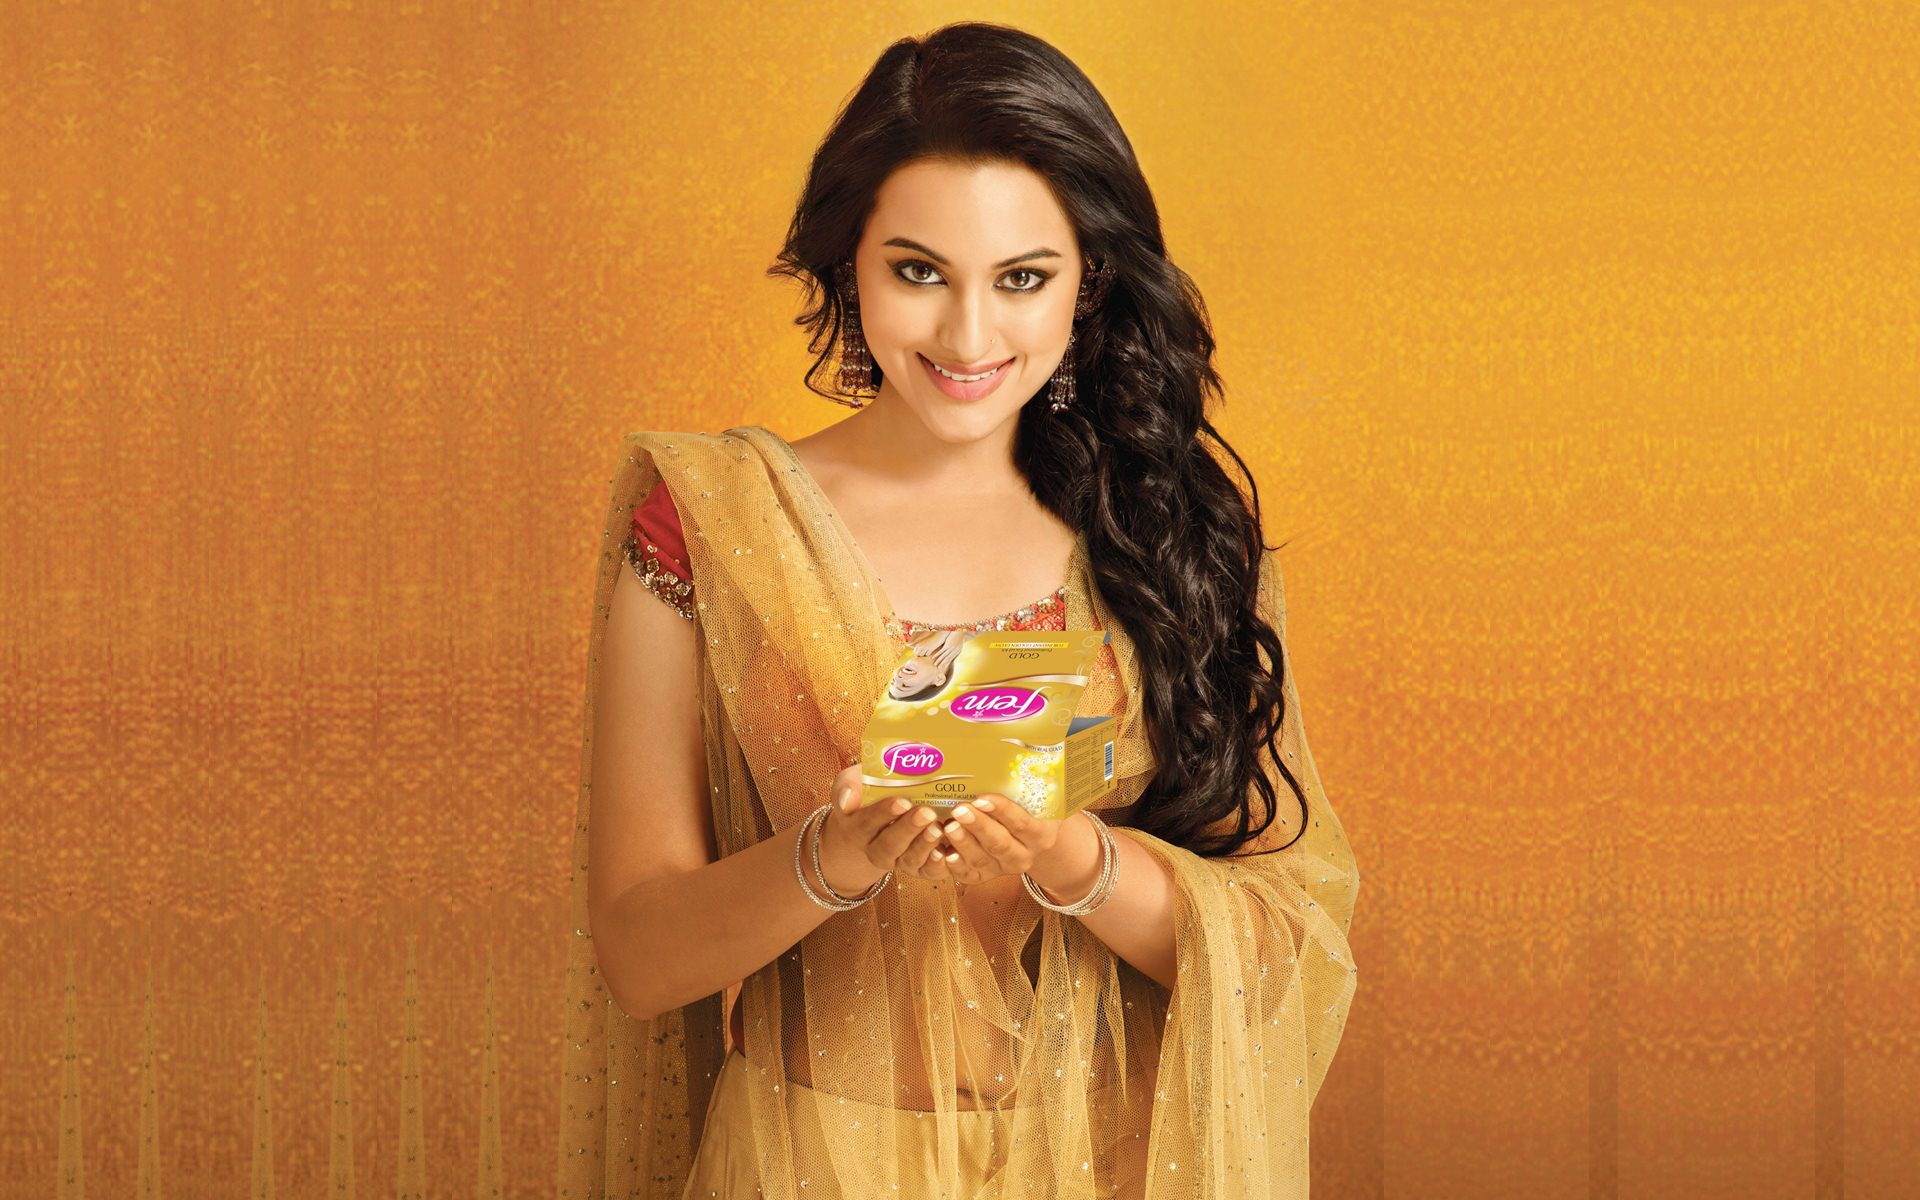 sonakshi sinha indian actress wallpaper 66175